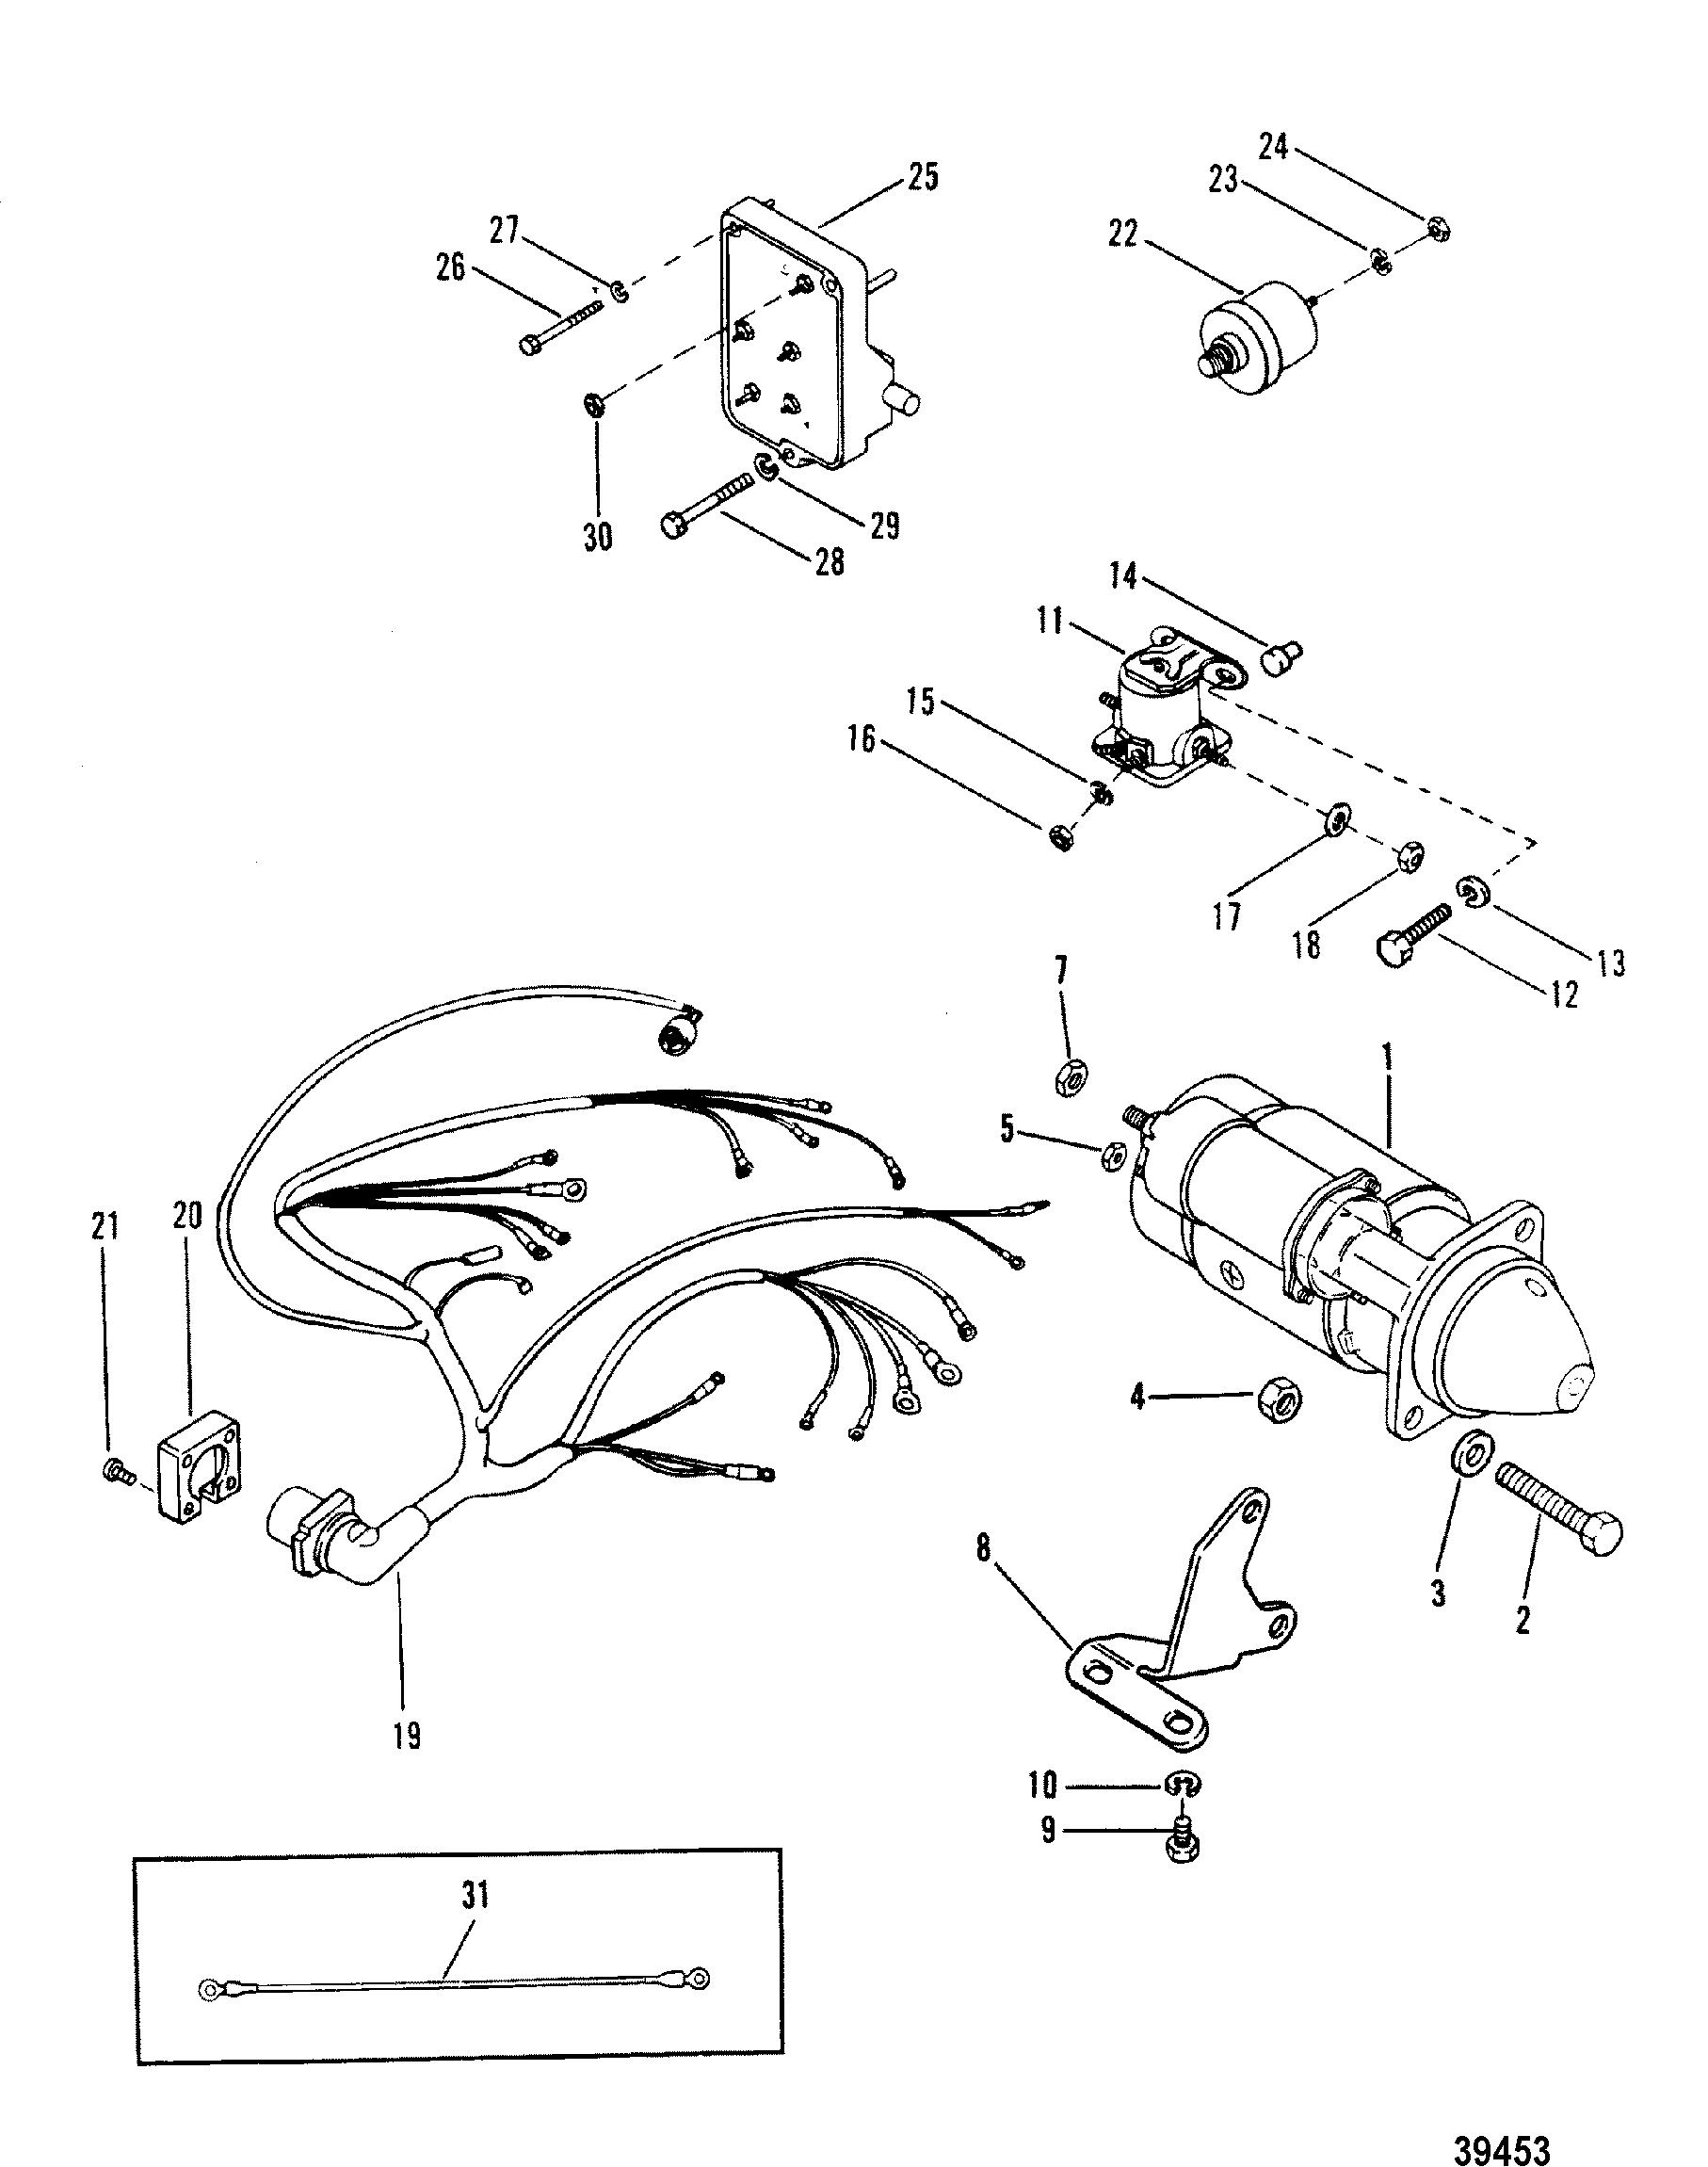 mc_2633] omc 3 0 wiring diagram mercruiser 165 ignition wiring ... omc 165 starter wiring diagram mercruiser 3.0 alternator wiring diagram geis aidew illuminateatx librar wiring 101